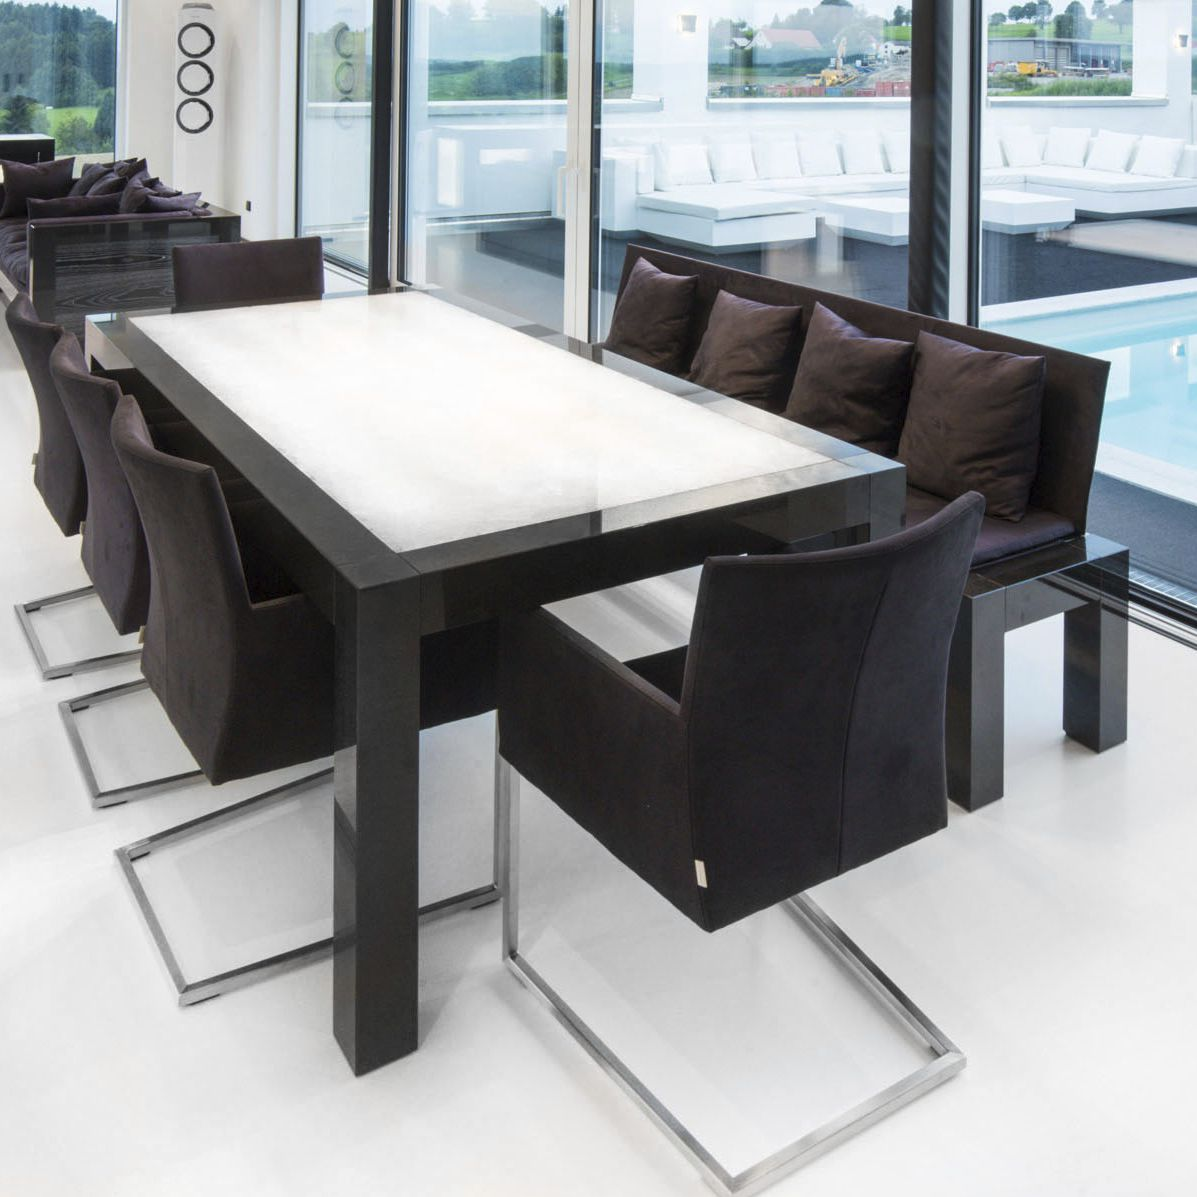 Table A Manger Contemporaine En Granite Rectangulaire Lumineuse Led Luis Design